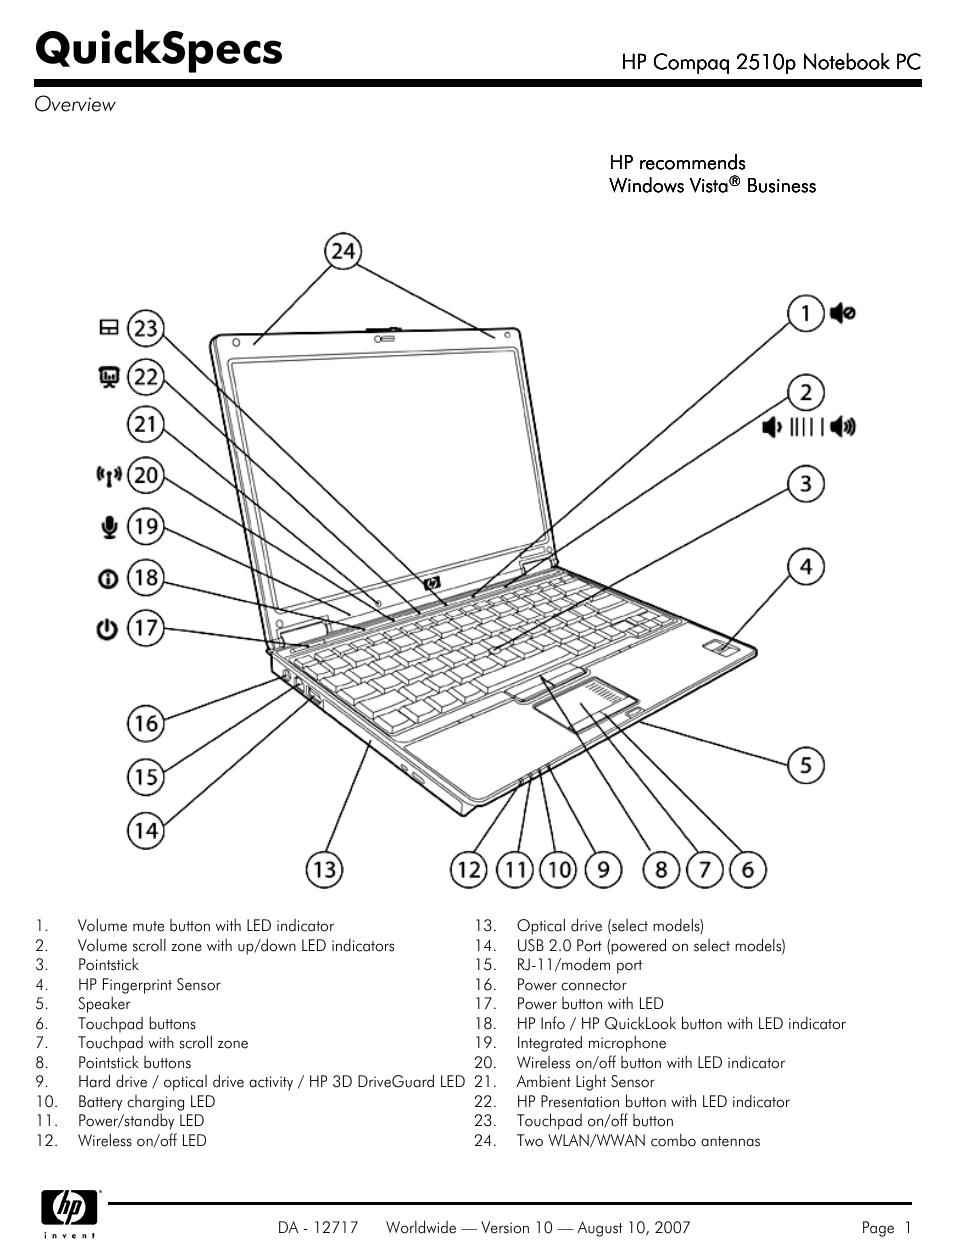 compaq 2510p user manual 39 pages rh manualsdir com hp 2510p user manual hp 2510p manual pdf